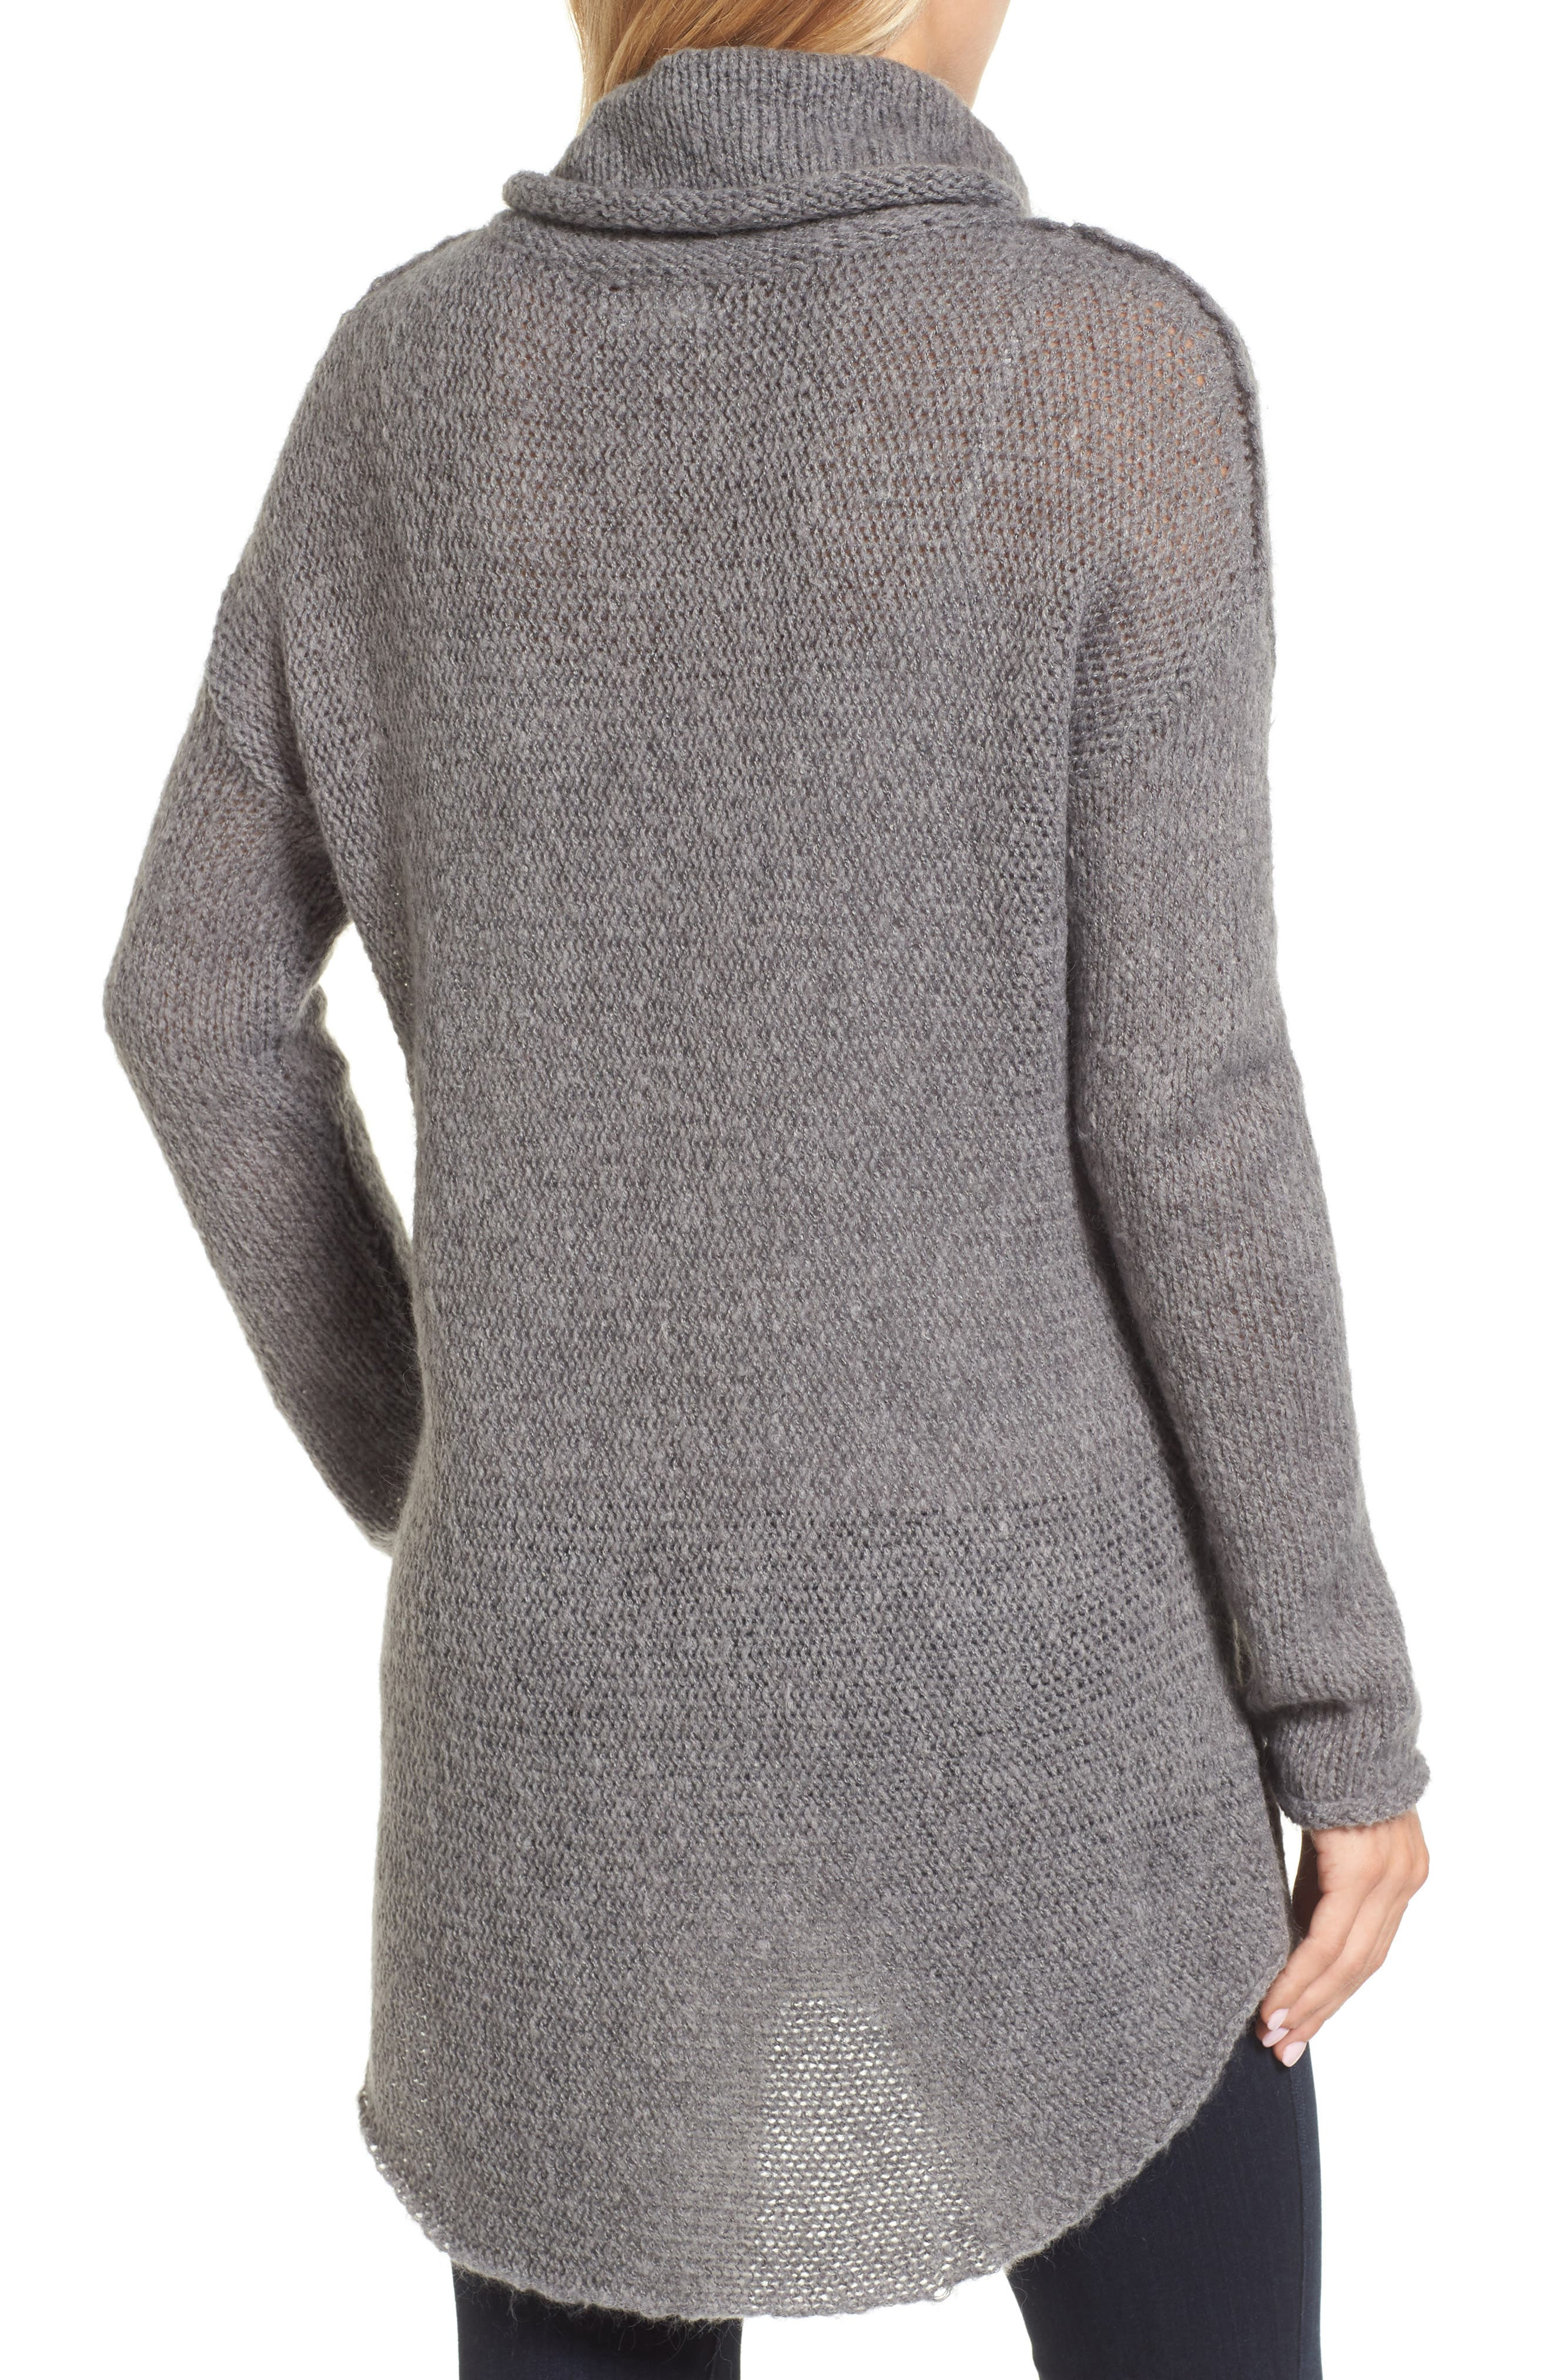 Tunic Sweater,                             Alternate thumbnail 2, color,                             GREY DARK HEATHER